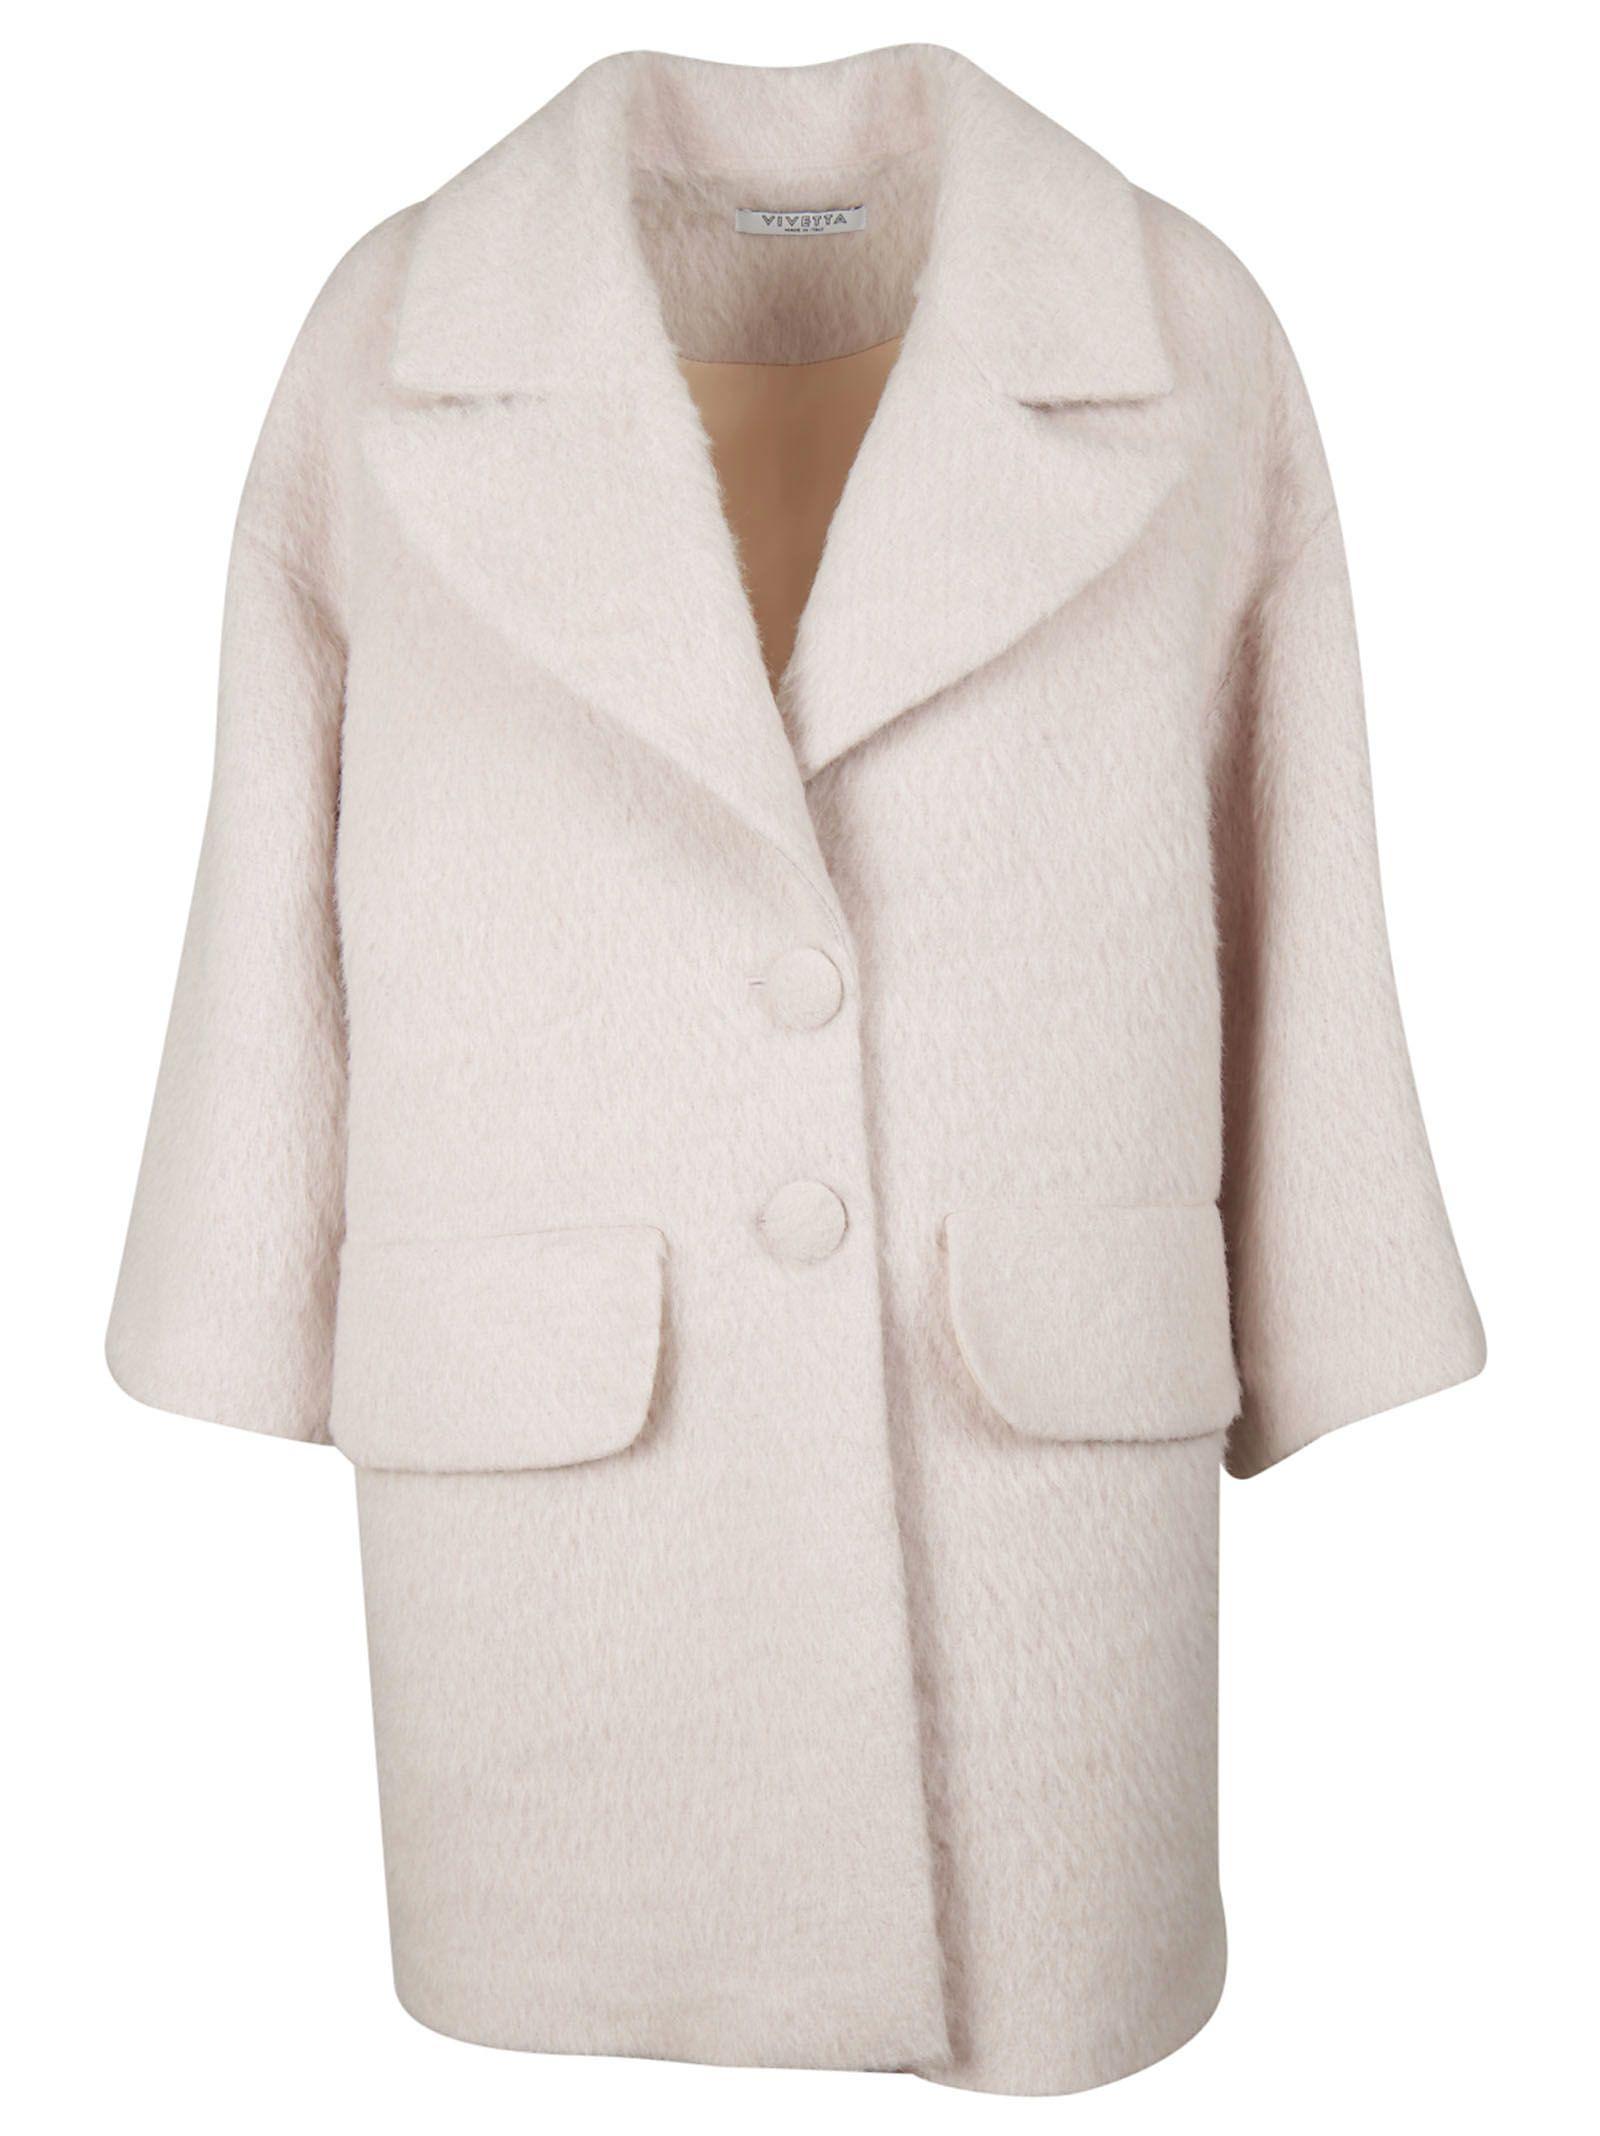 Vivetta Oversized Collar Coat